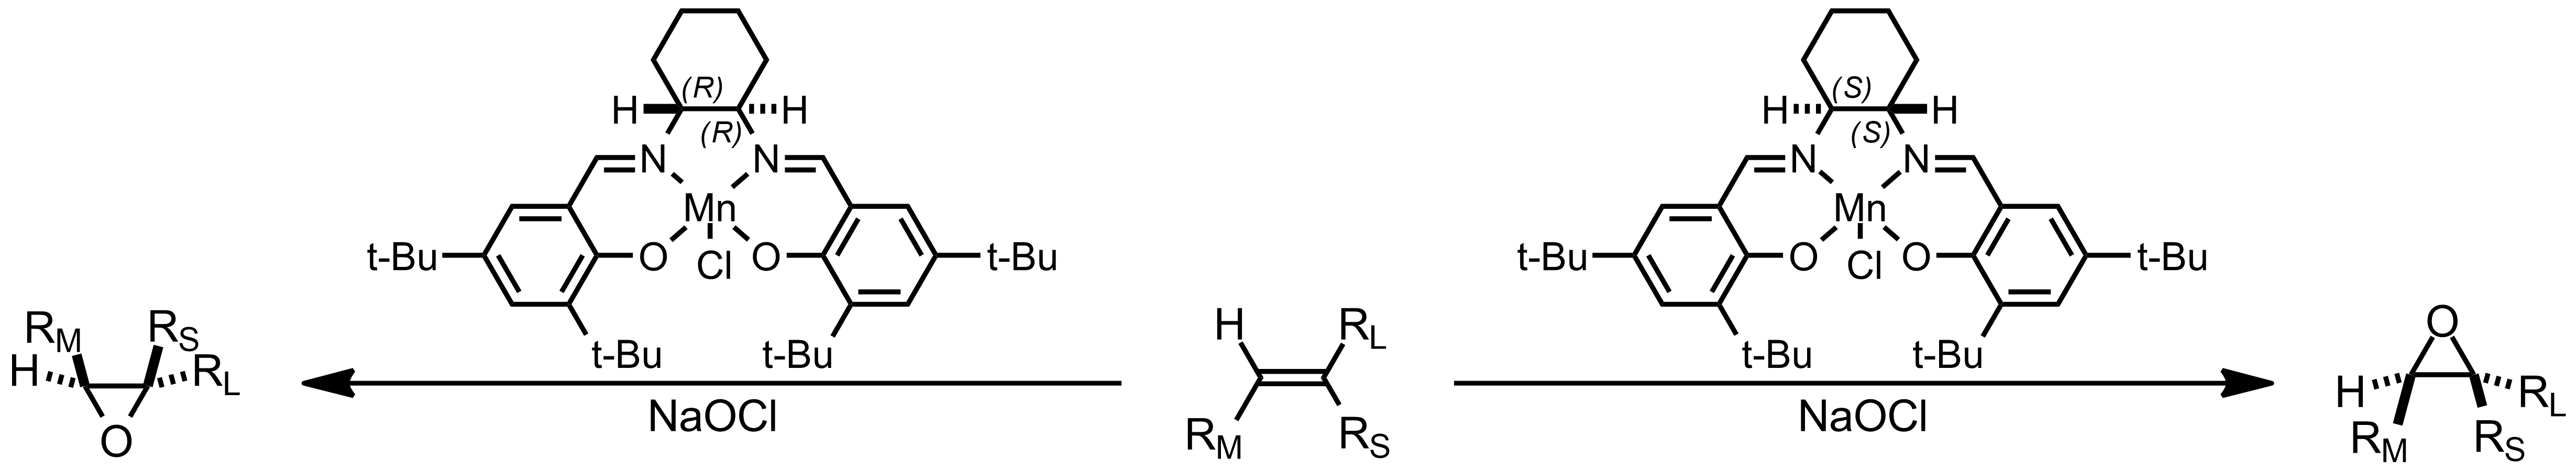 Schematic representation of the Jacobsen-Katsuki Asymmetric Epoxidation.